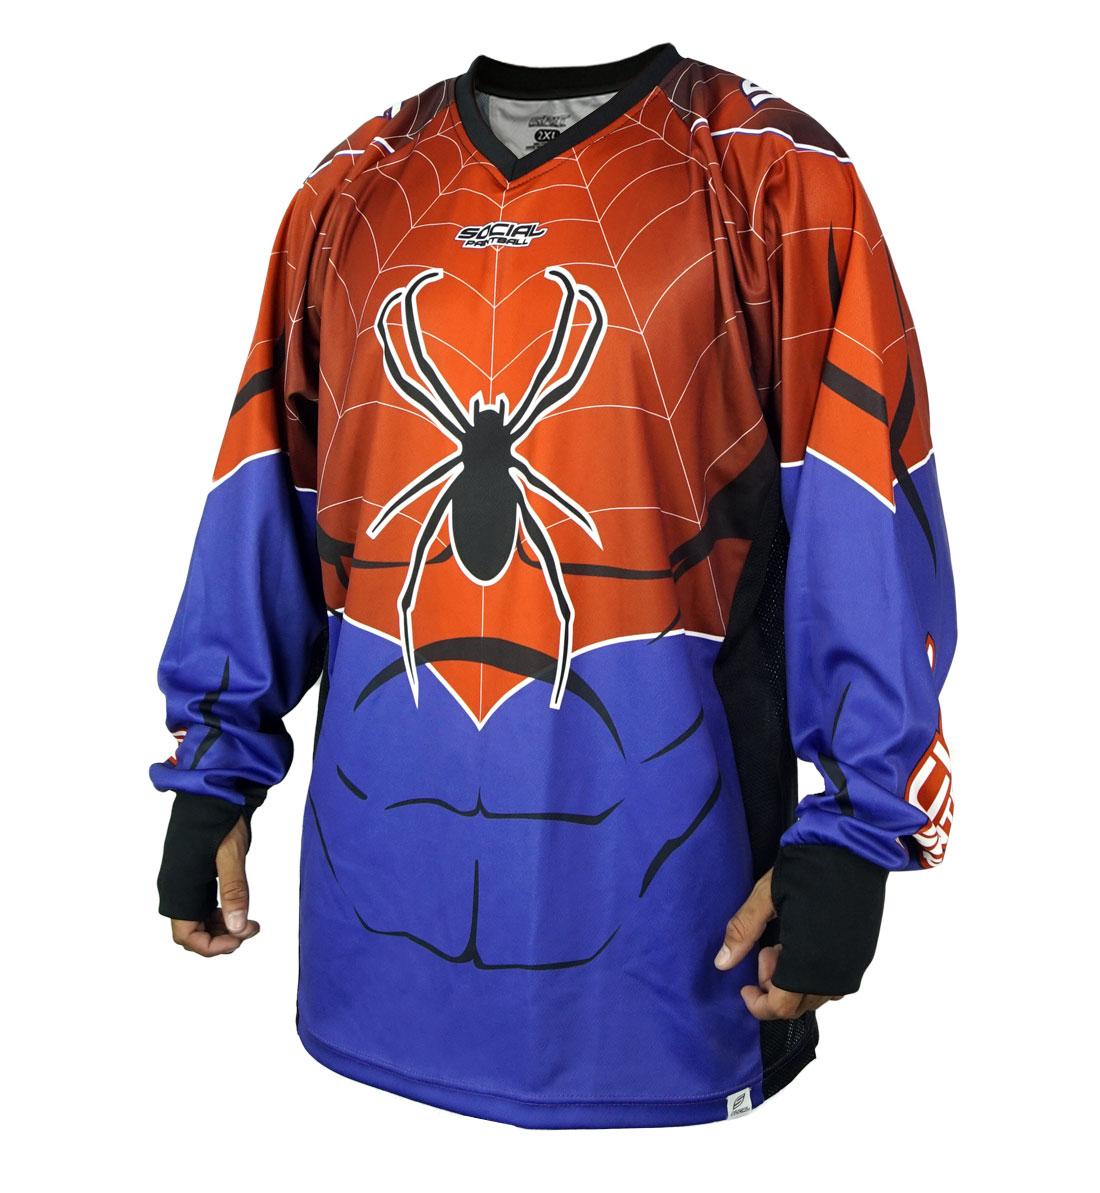 spiderman jersey